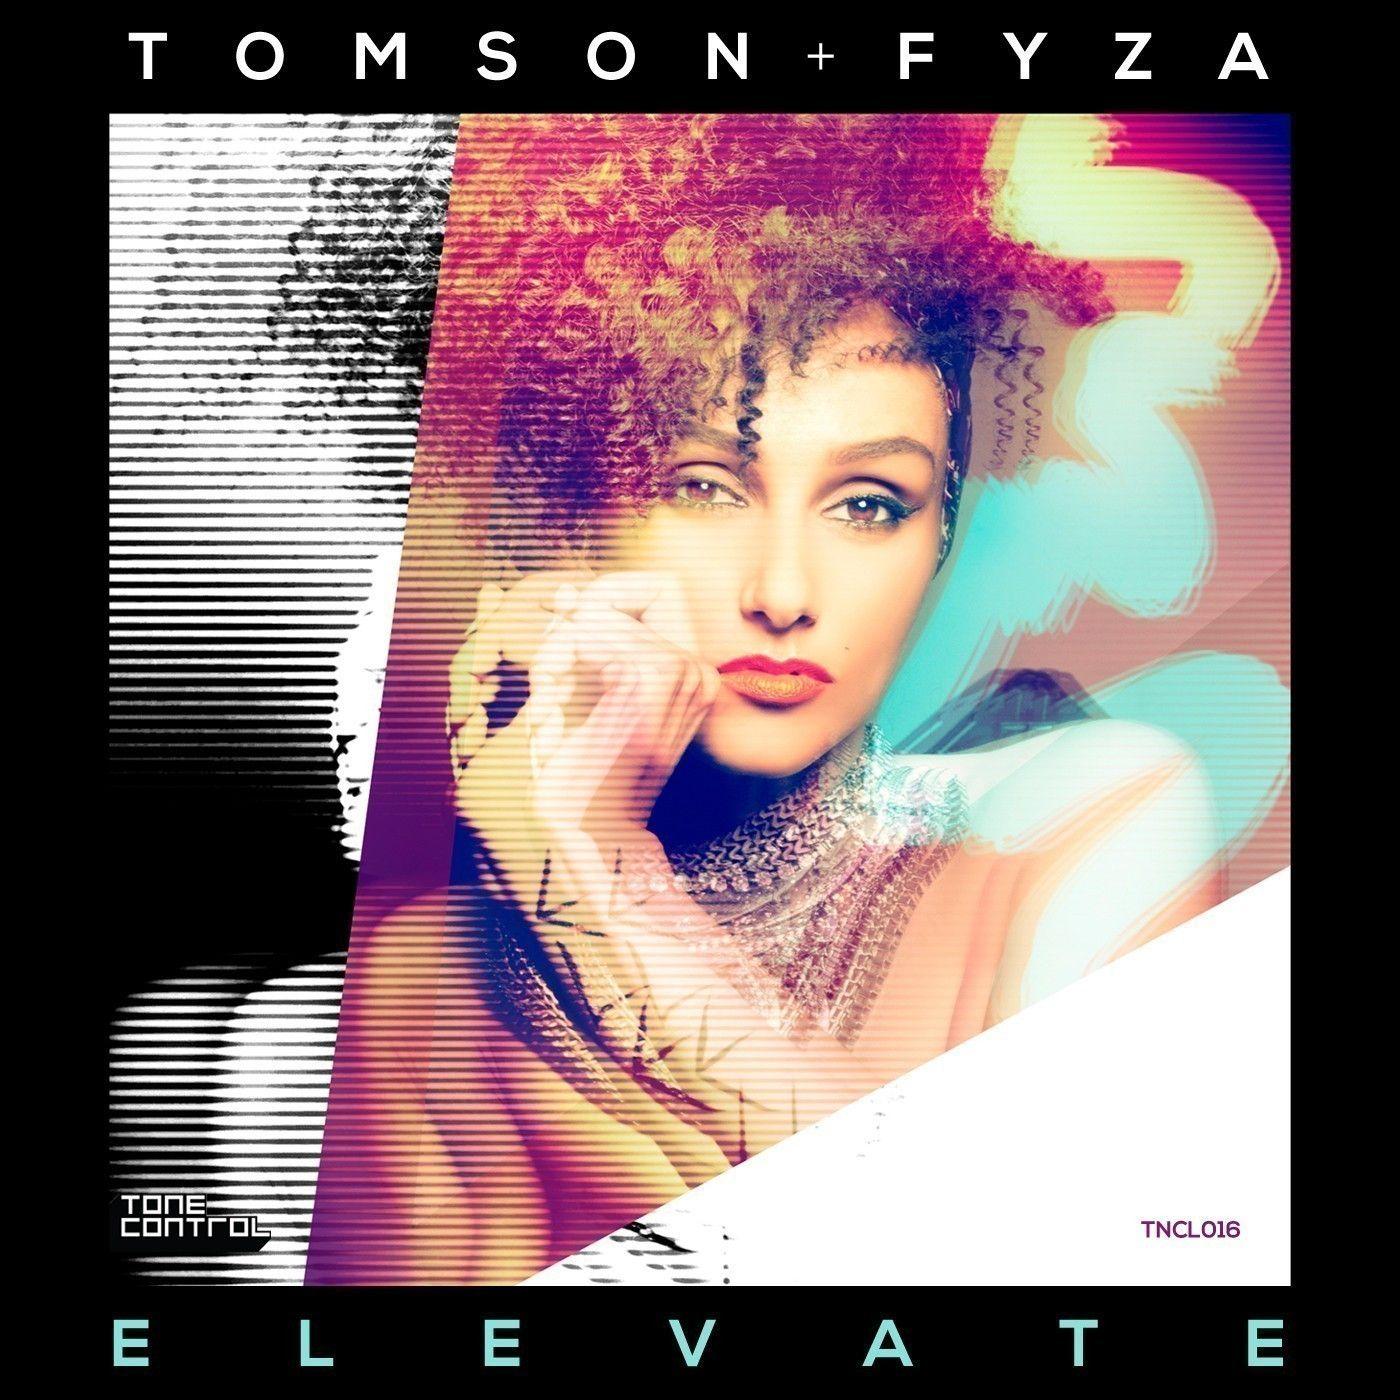 tomson-fyza-cover-v6.jpg